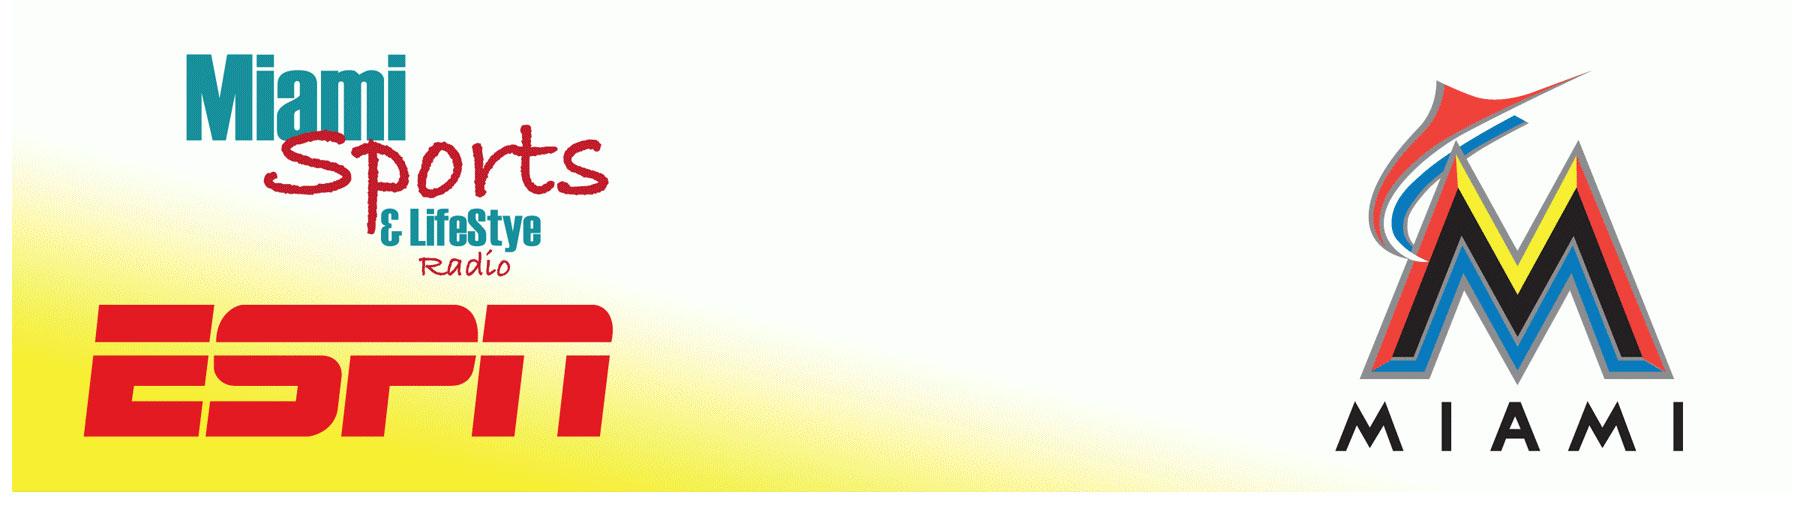 Andrew Powel Sports Show Banner Logo in Floirdal